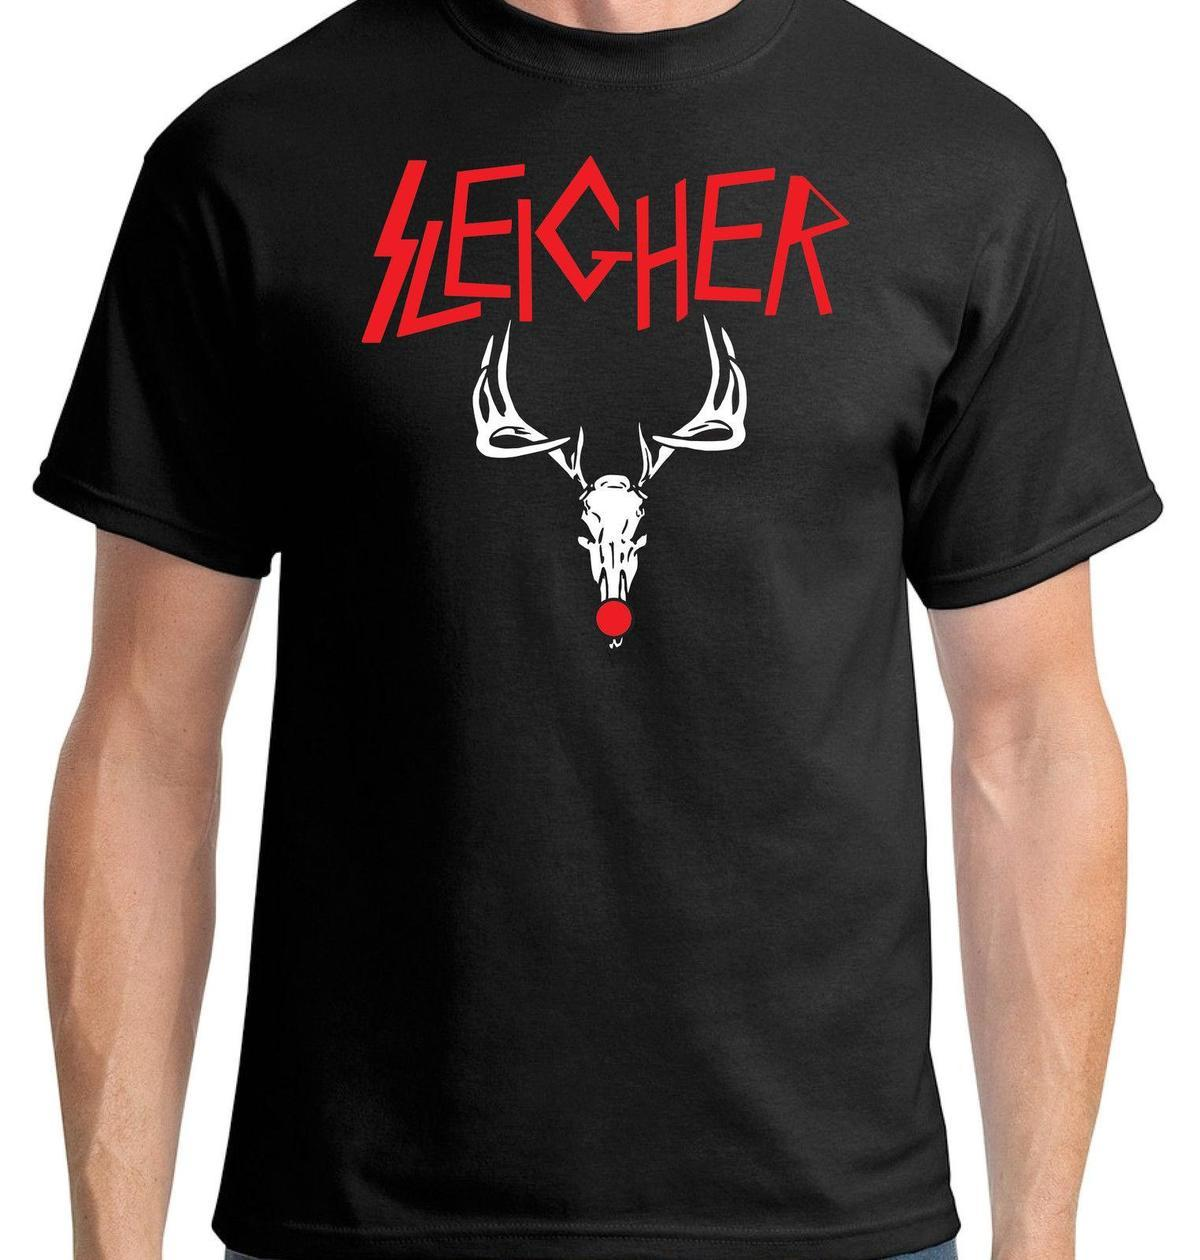 sleigher t shirt heavy metal rock thrash funny christmas tee rudolph reindeer designable t shirts buy funny shirts from liguo0053 1279 dhgatecom - Funny Christmas T Shirts